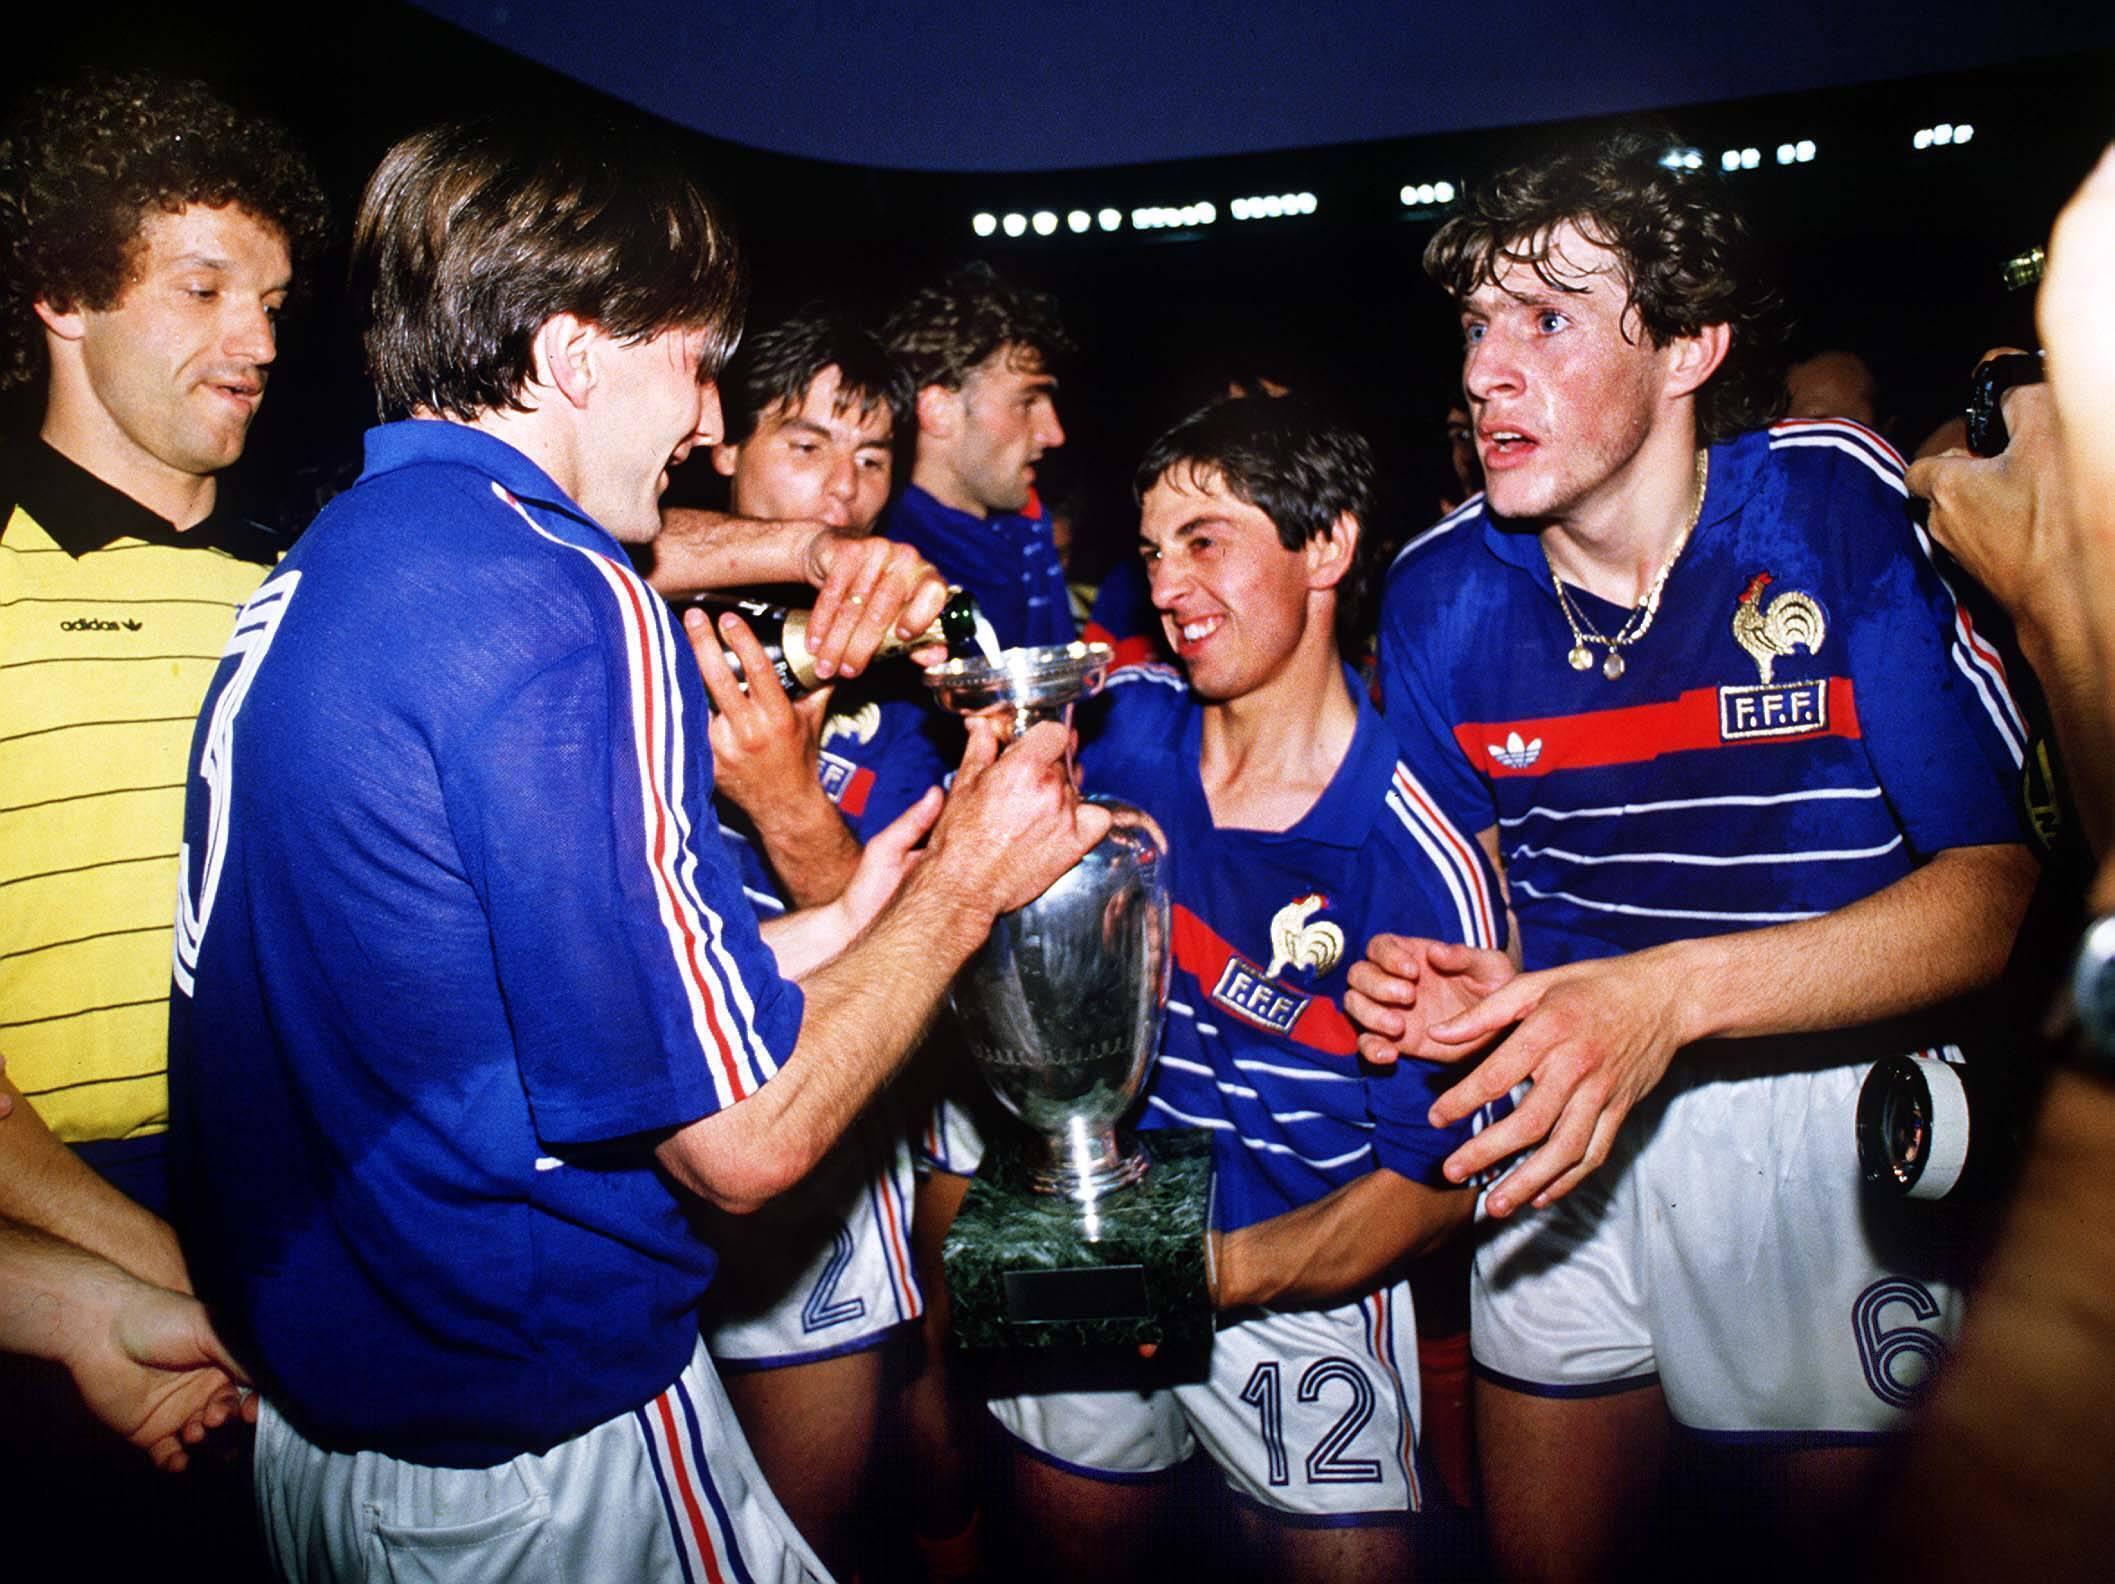 Football - Equipe de France - Luis Fernandez en quête de la FFF ... Avec quels anciens Bleus ?